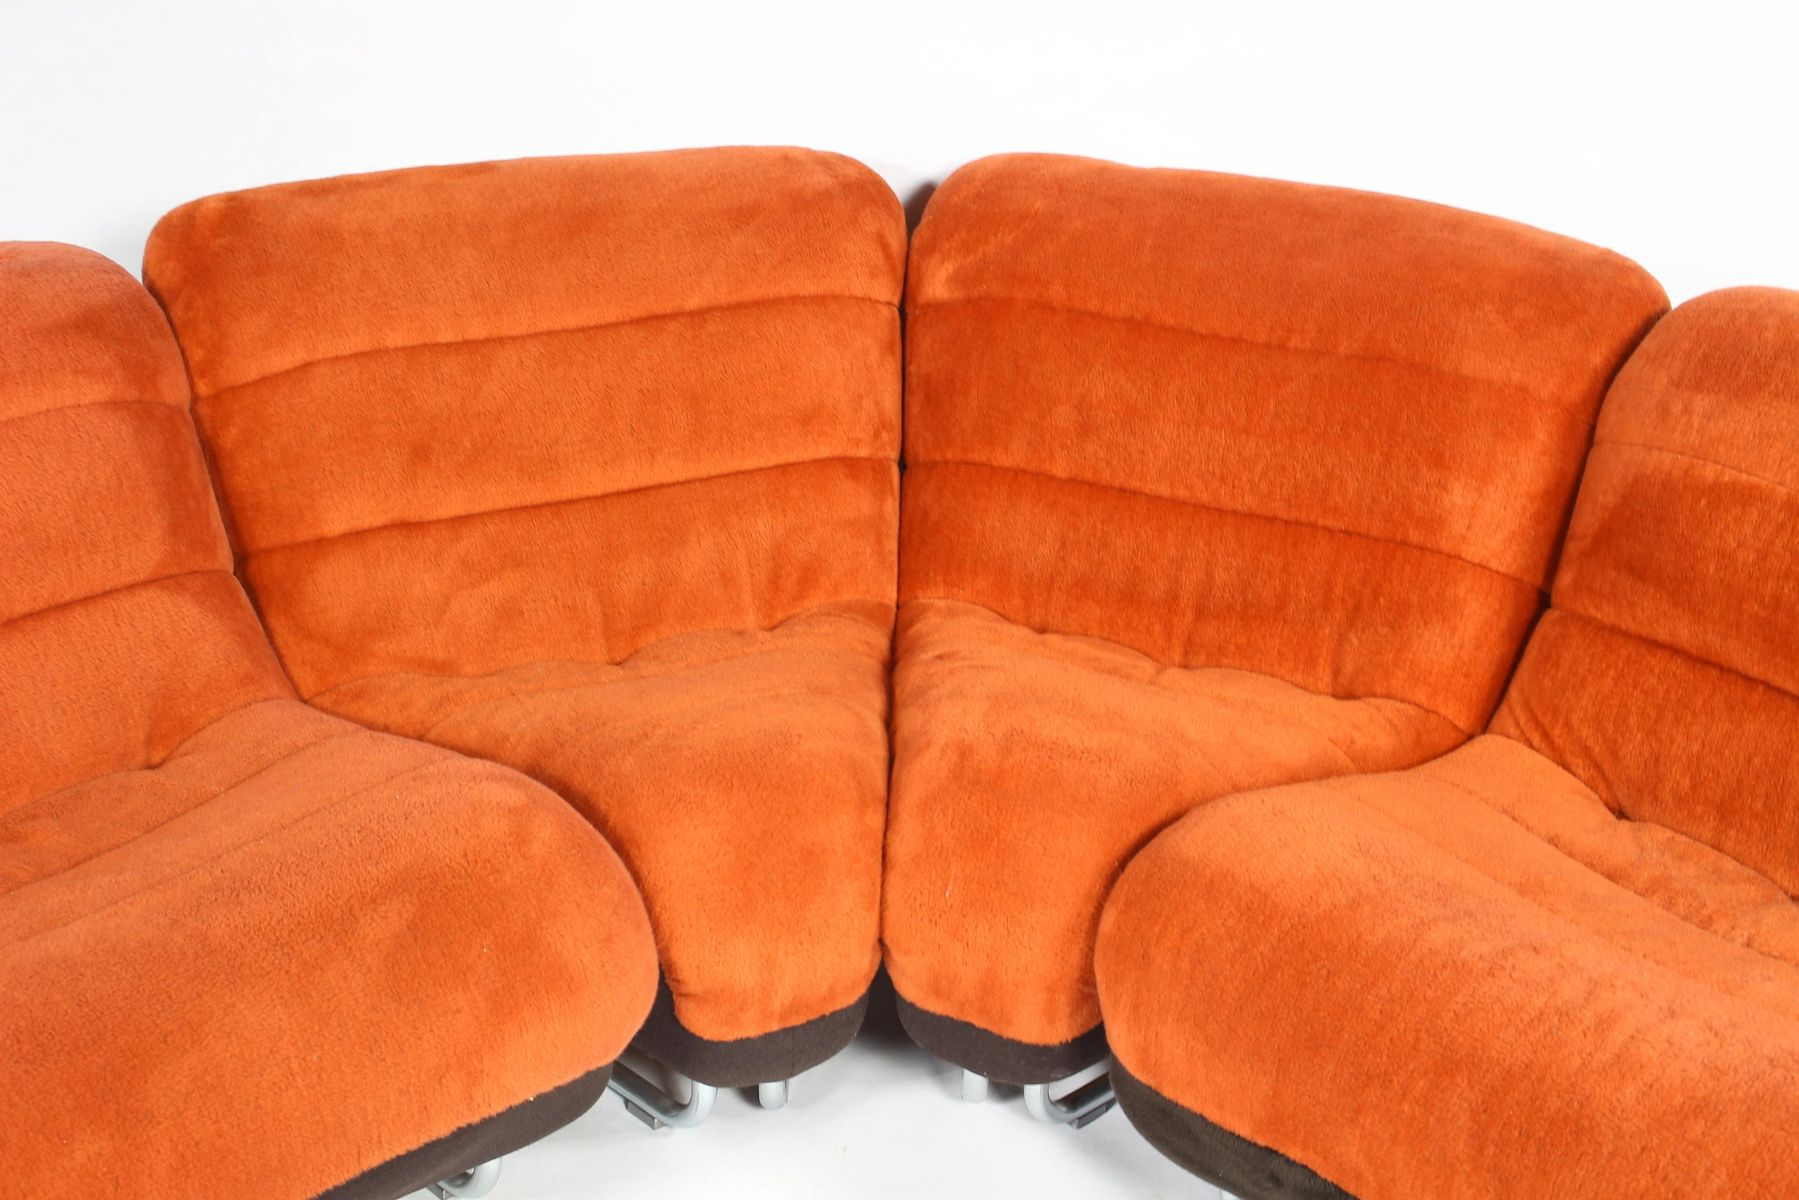 modulares sofa von rodney kinsman f r overman 1970er bei pamono kaufen. Black Bedroom Furniture Sets. Home Design Ideas